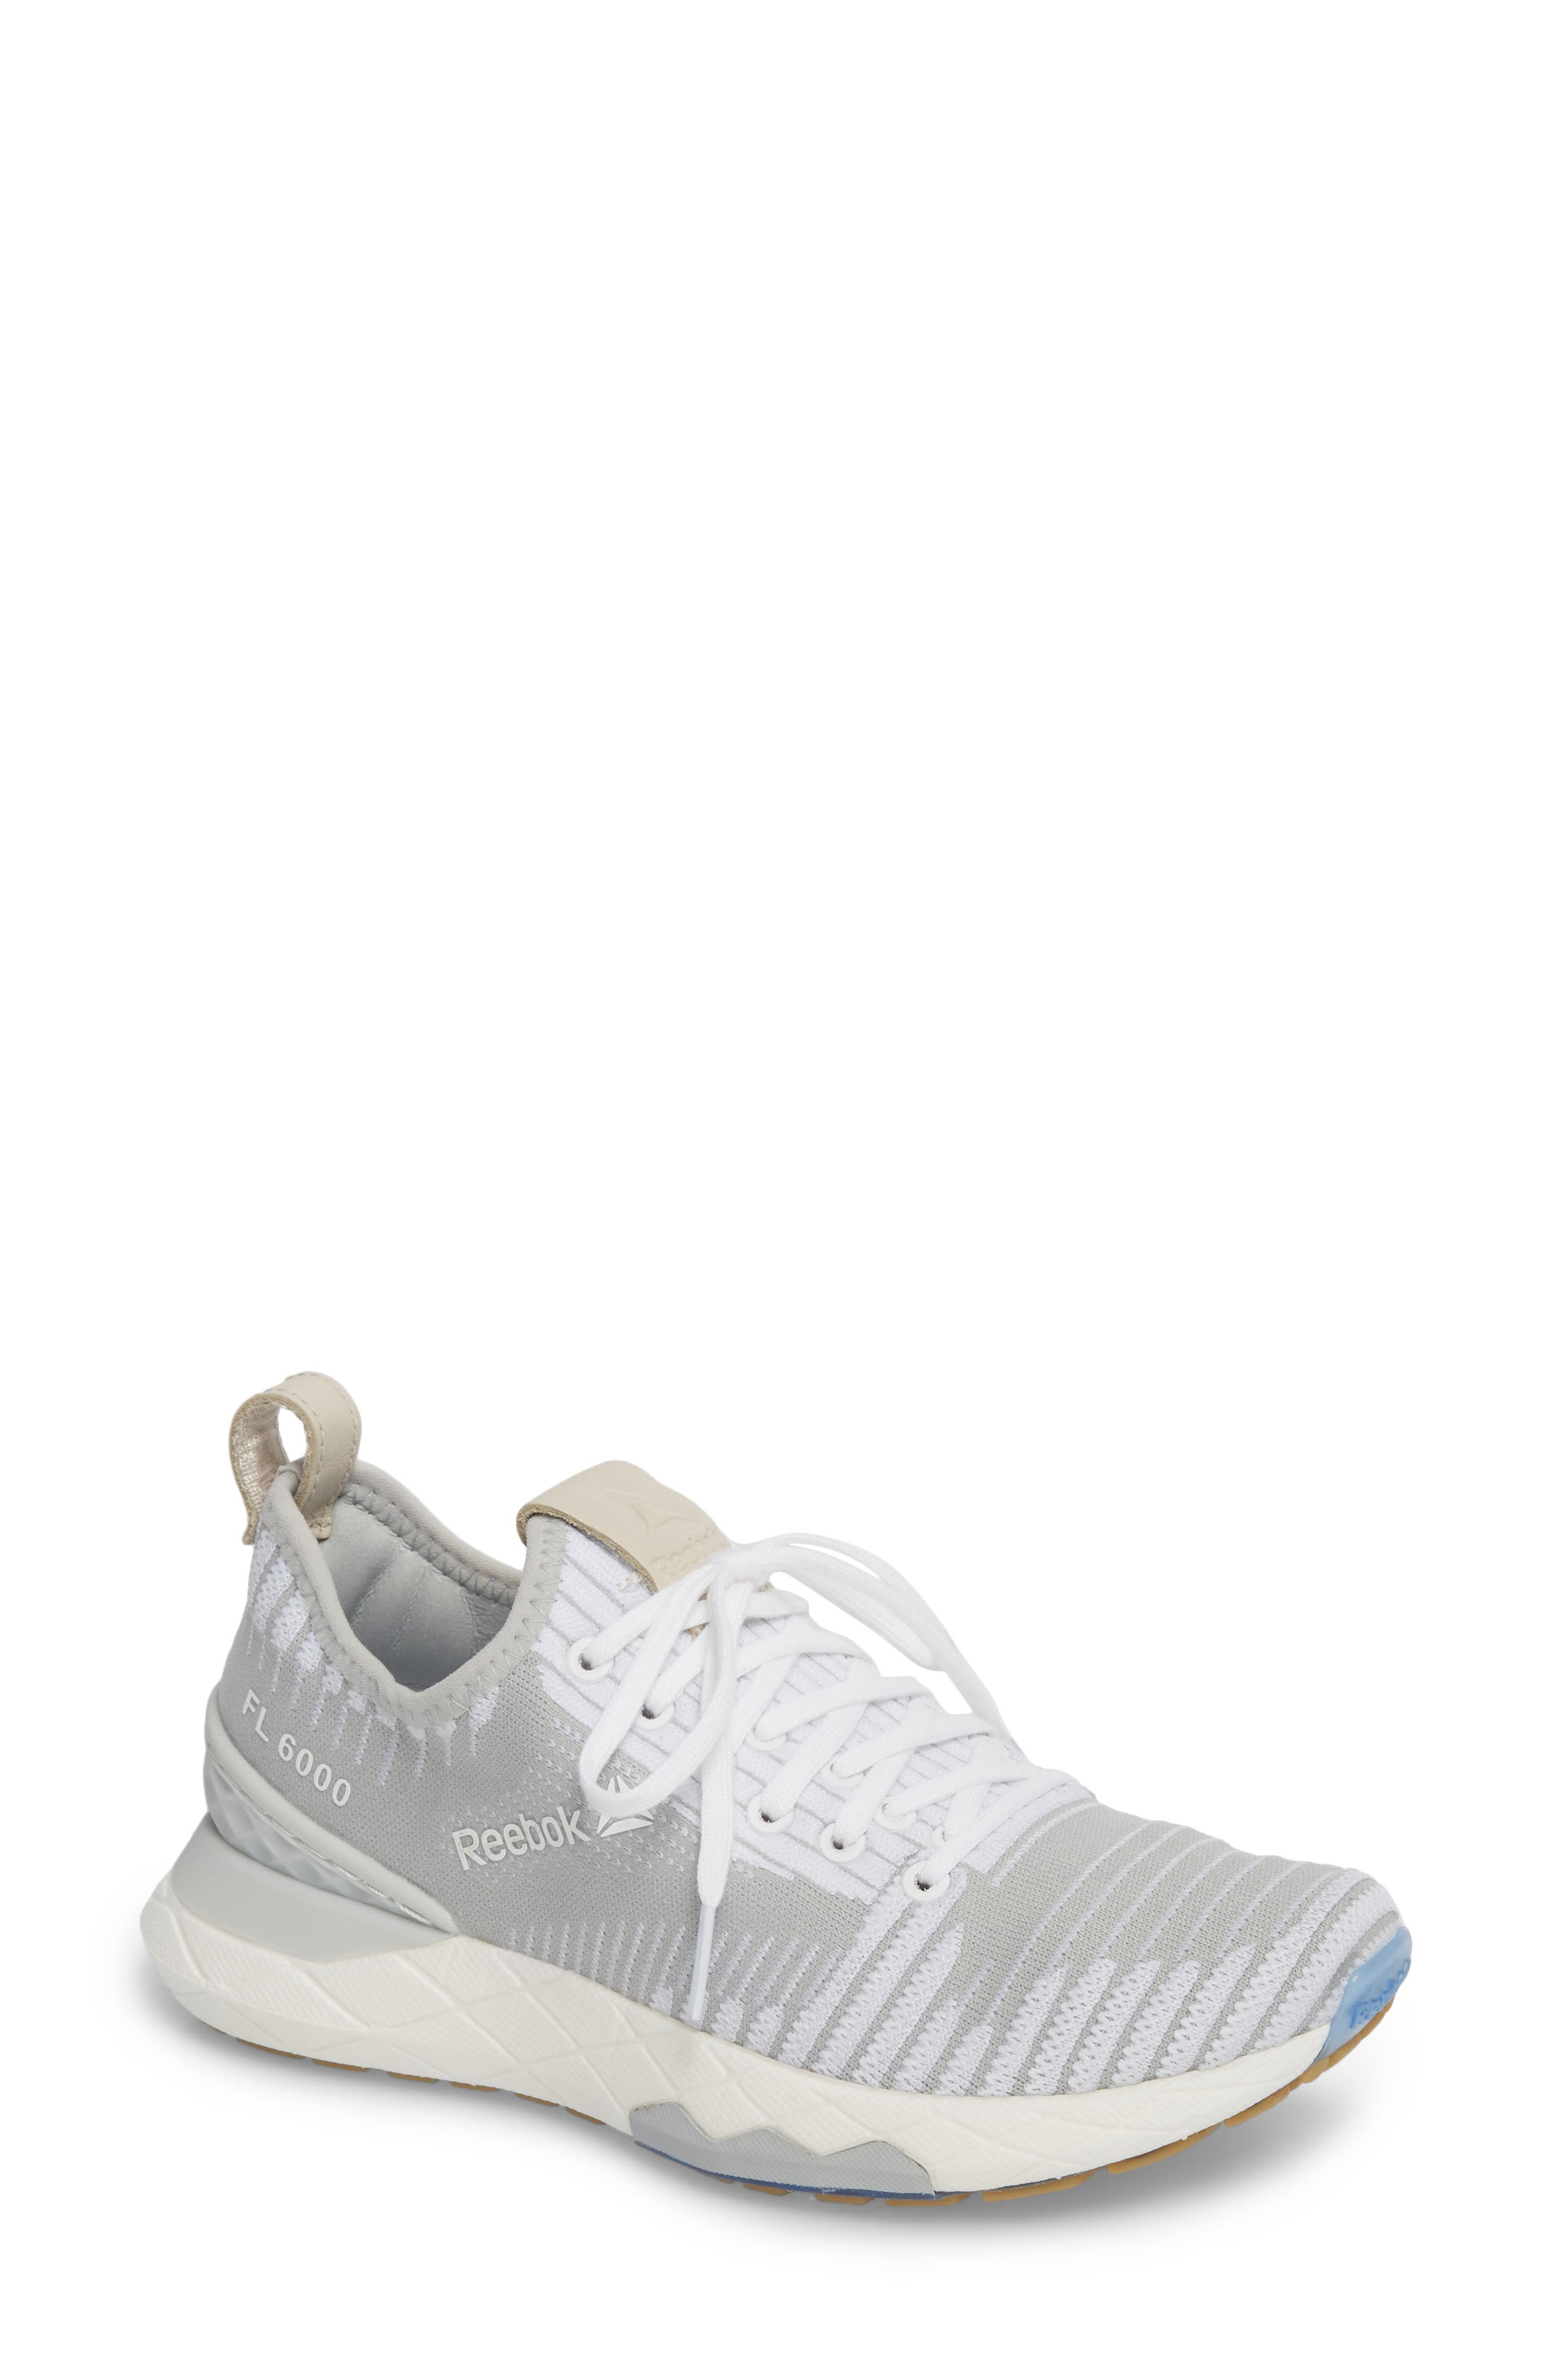 Floatride 6000 Running Shoe,                         Main,                         color, White/ Skull Grey